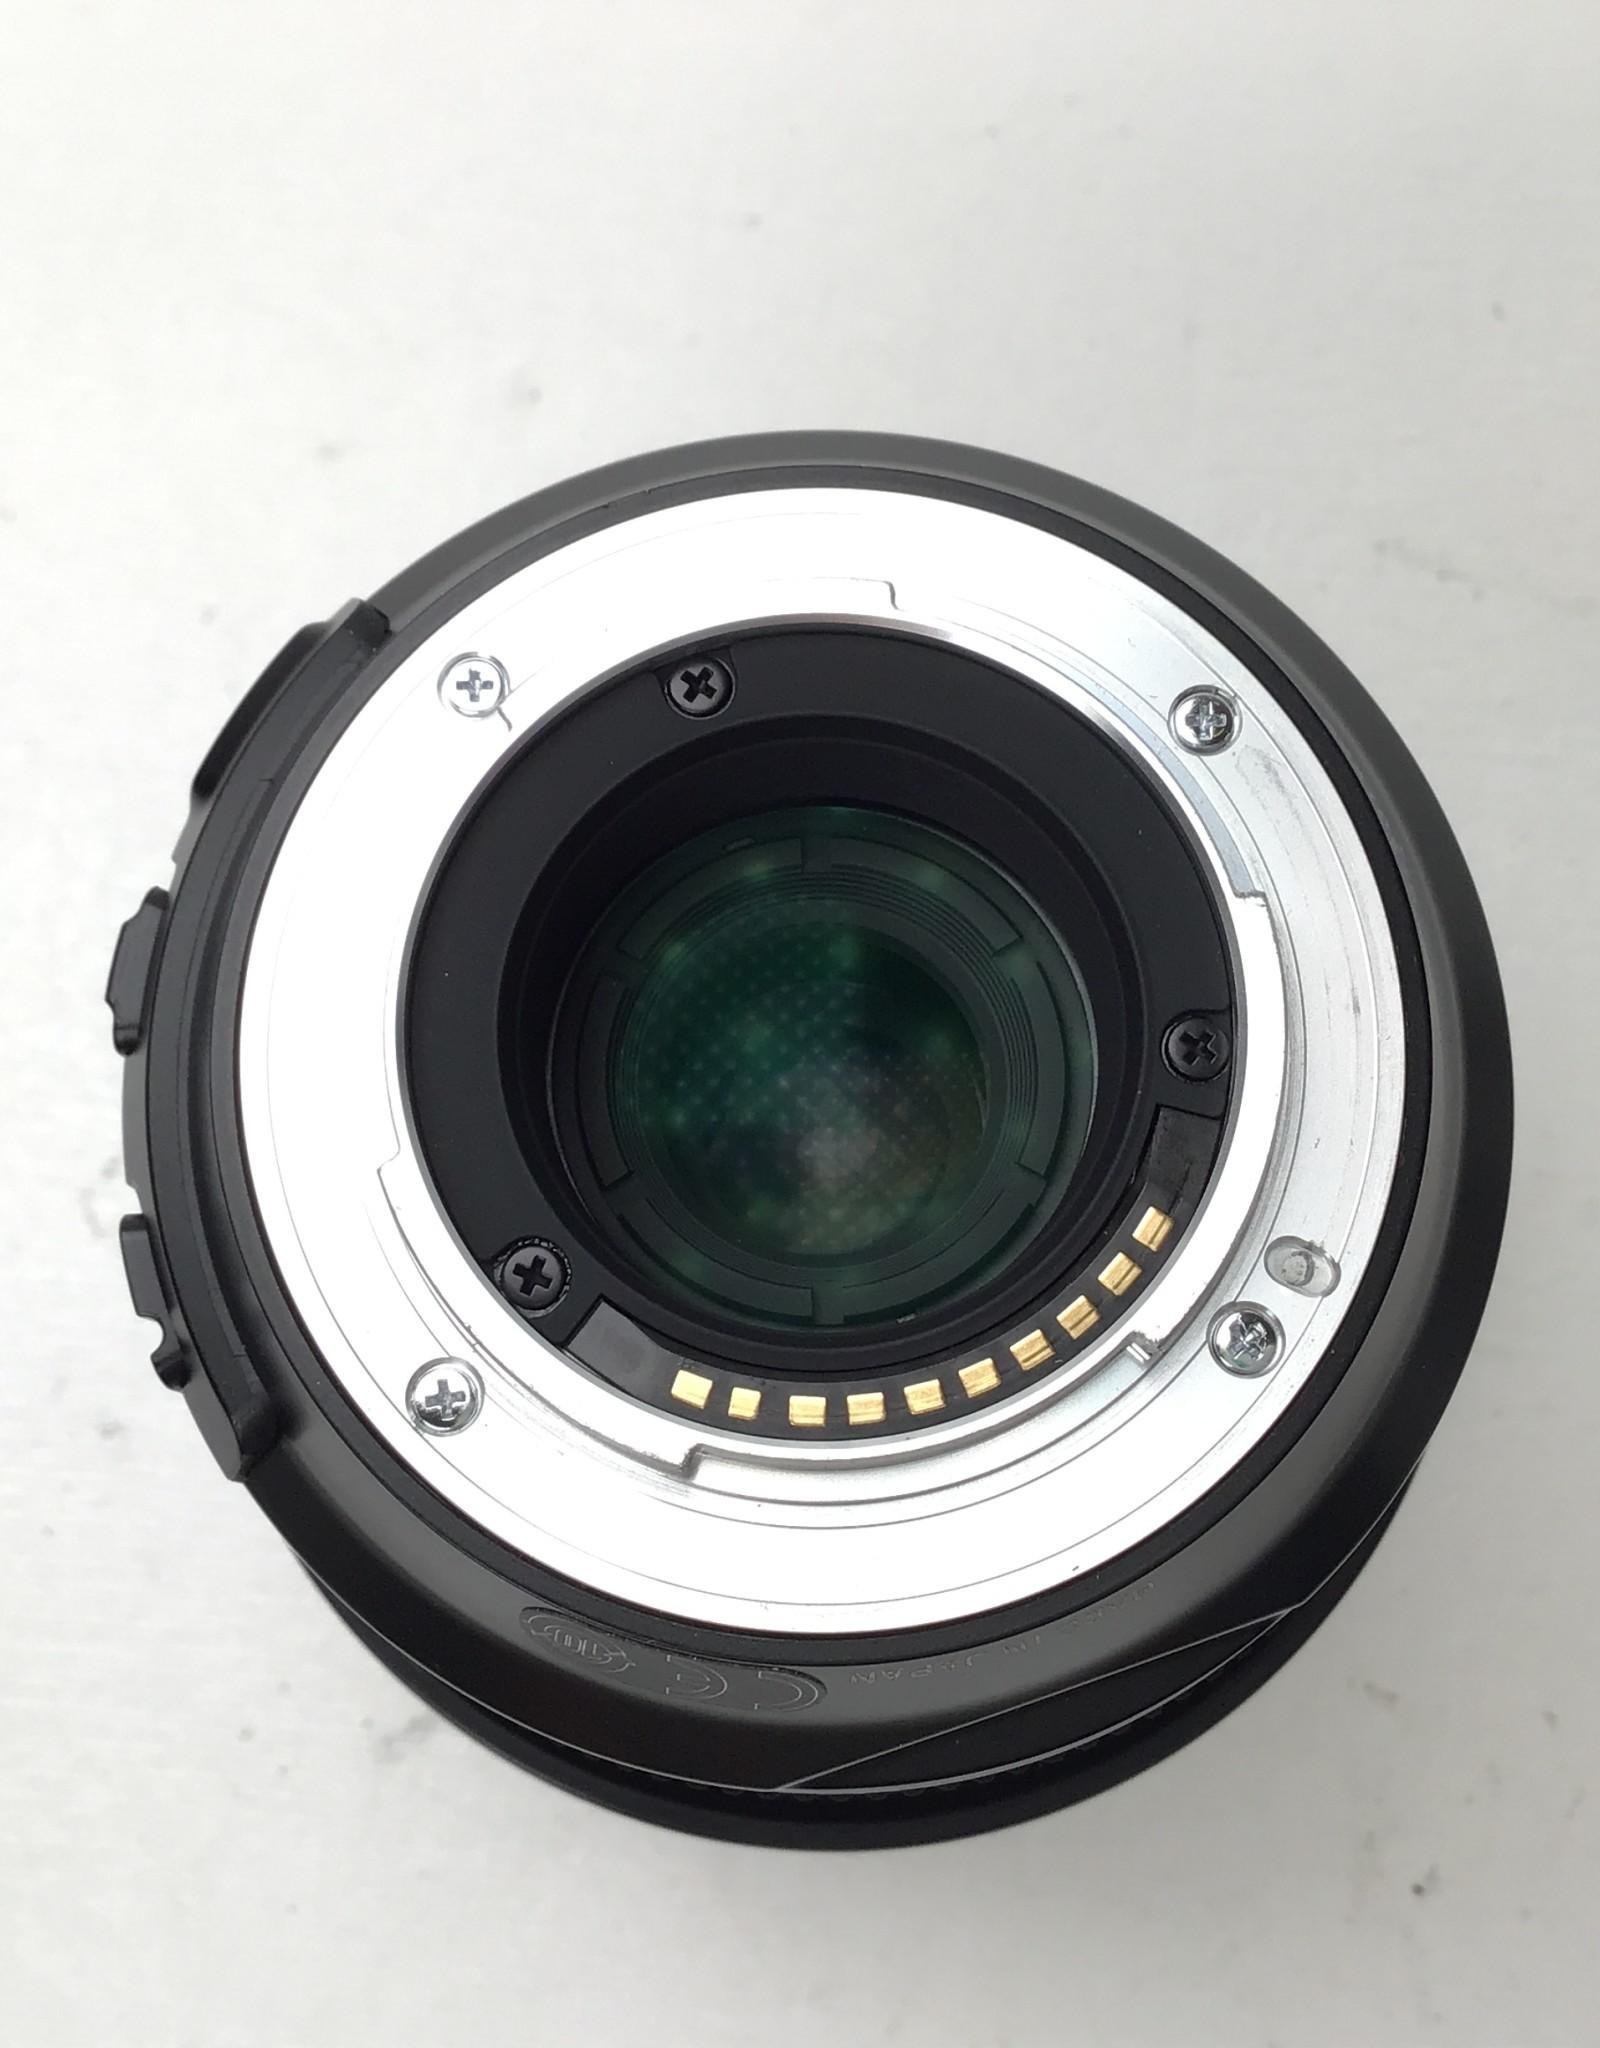 FUJI Fuji Super EBC XF 55-200mm f3.5-4.8 R LM OIS Lens Used EX